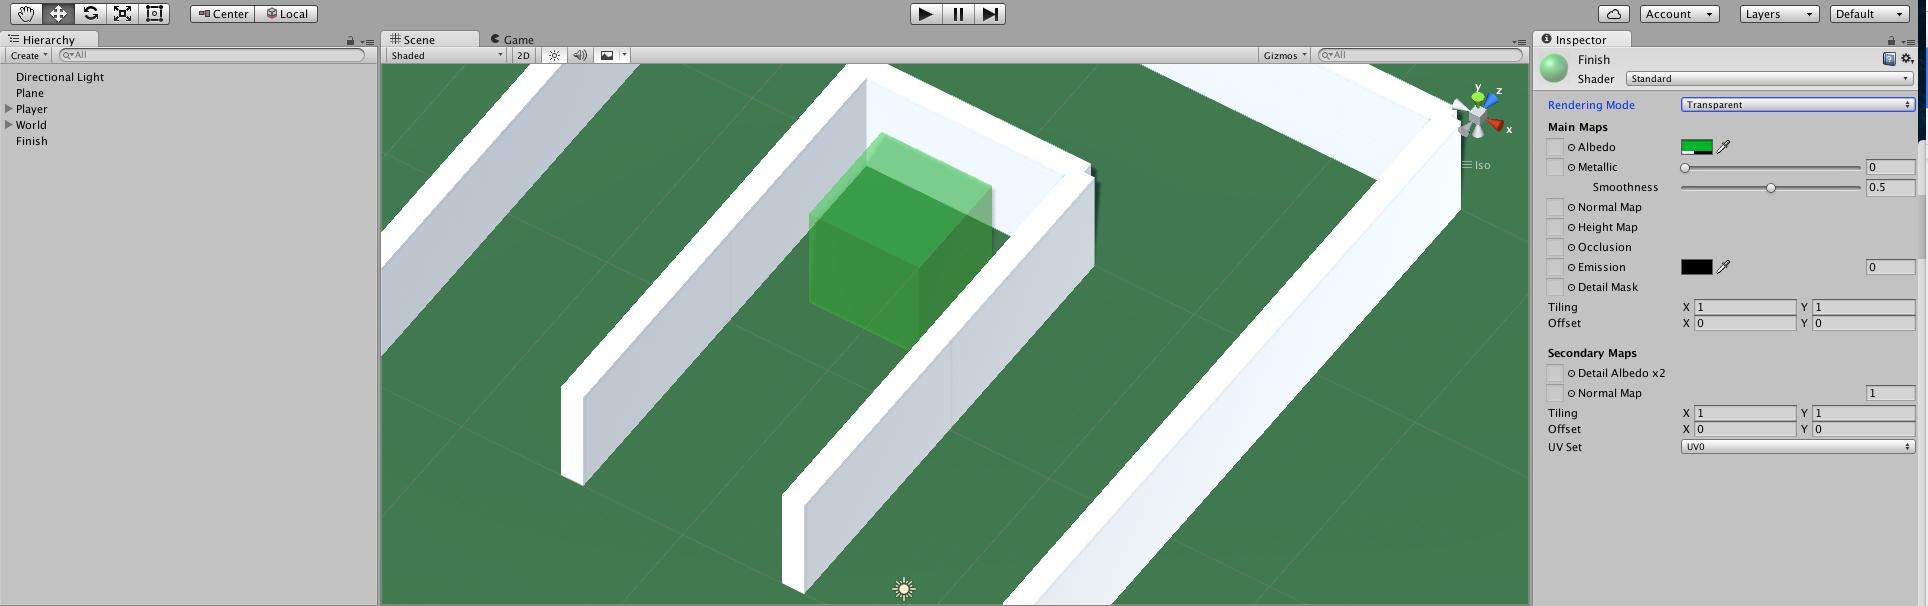 Building 3D Simulations In Unity3D | Java Code Geeks - 2019